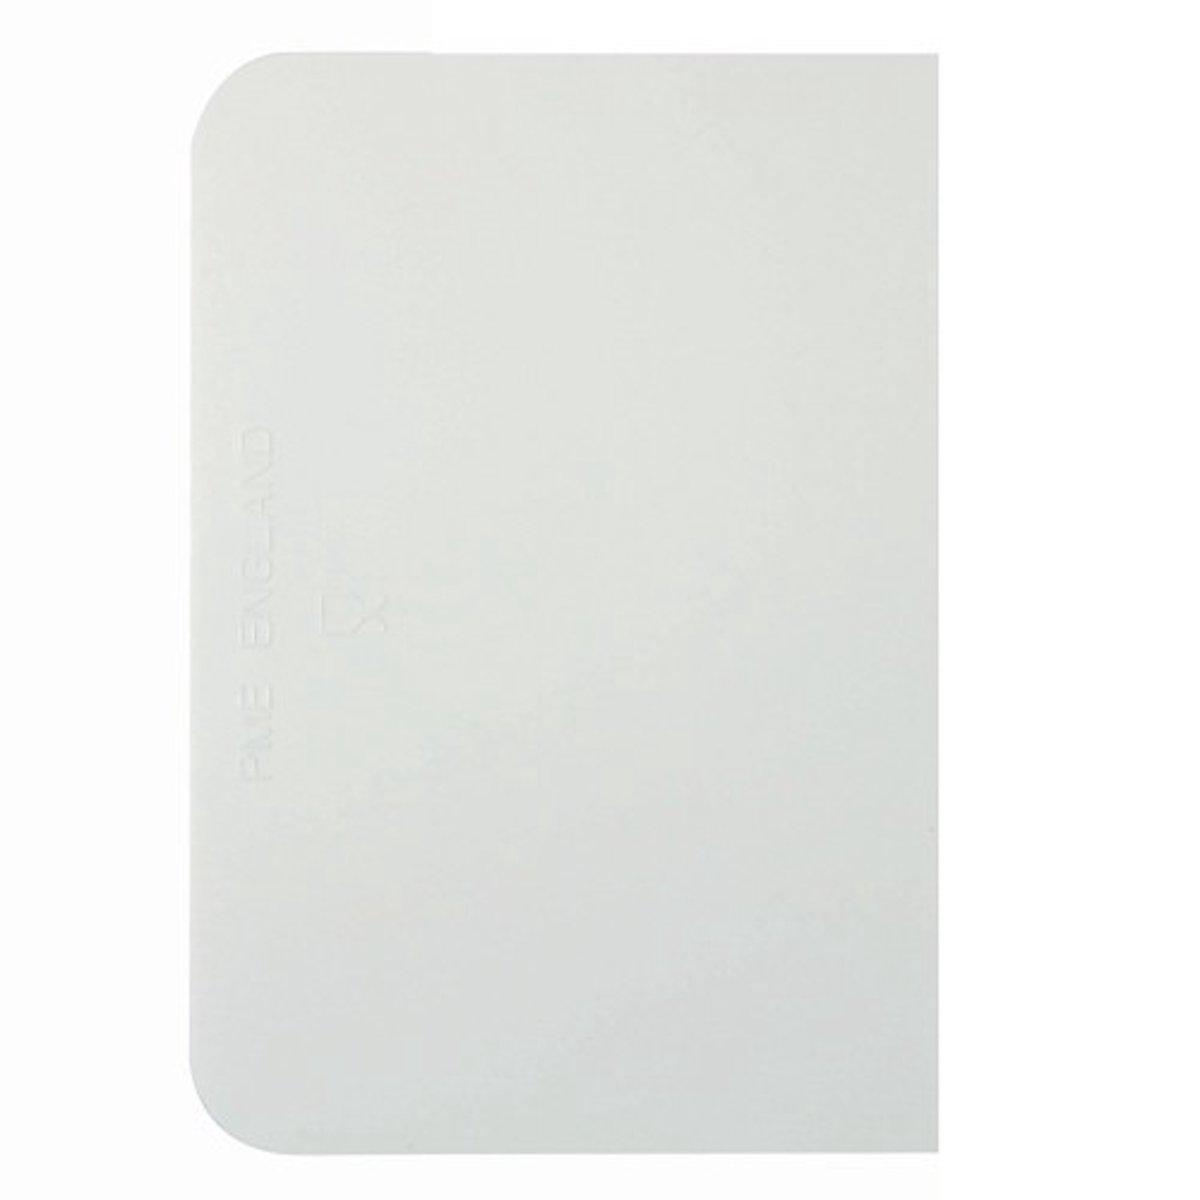 PME Deegkrabber Rechthoek 9,3 x 13,3cm kopen